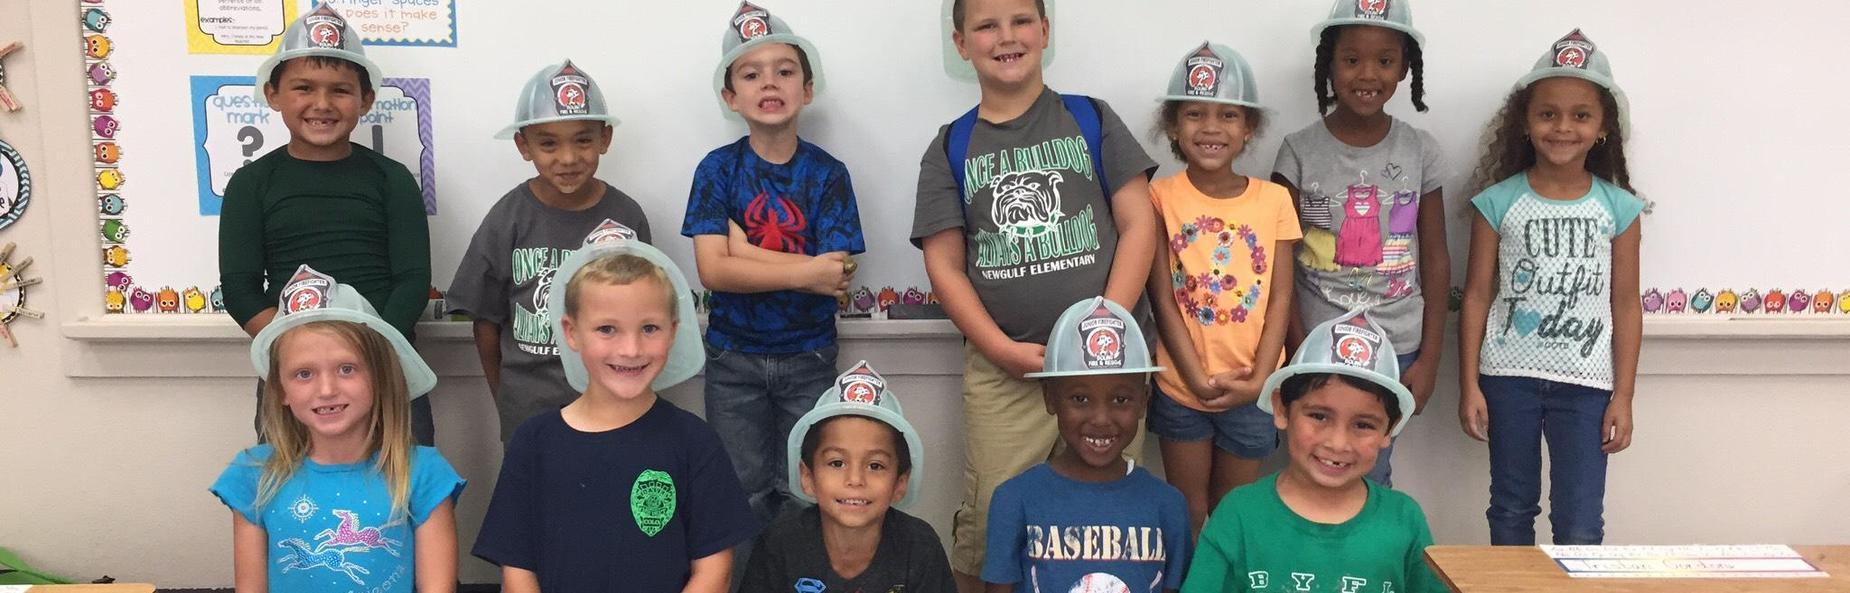 Children wearing firemen helmets